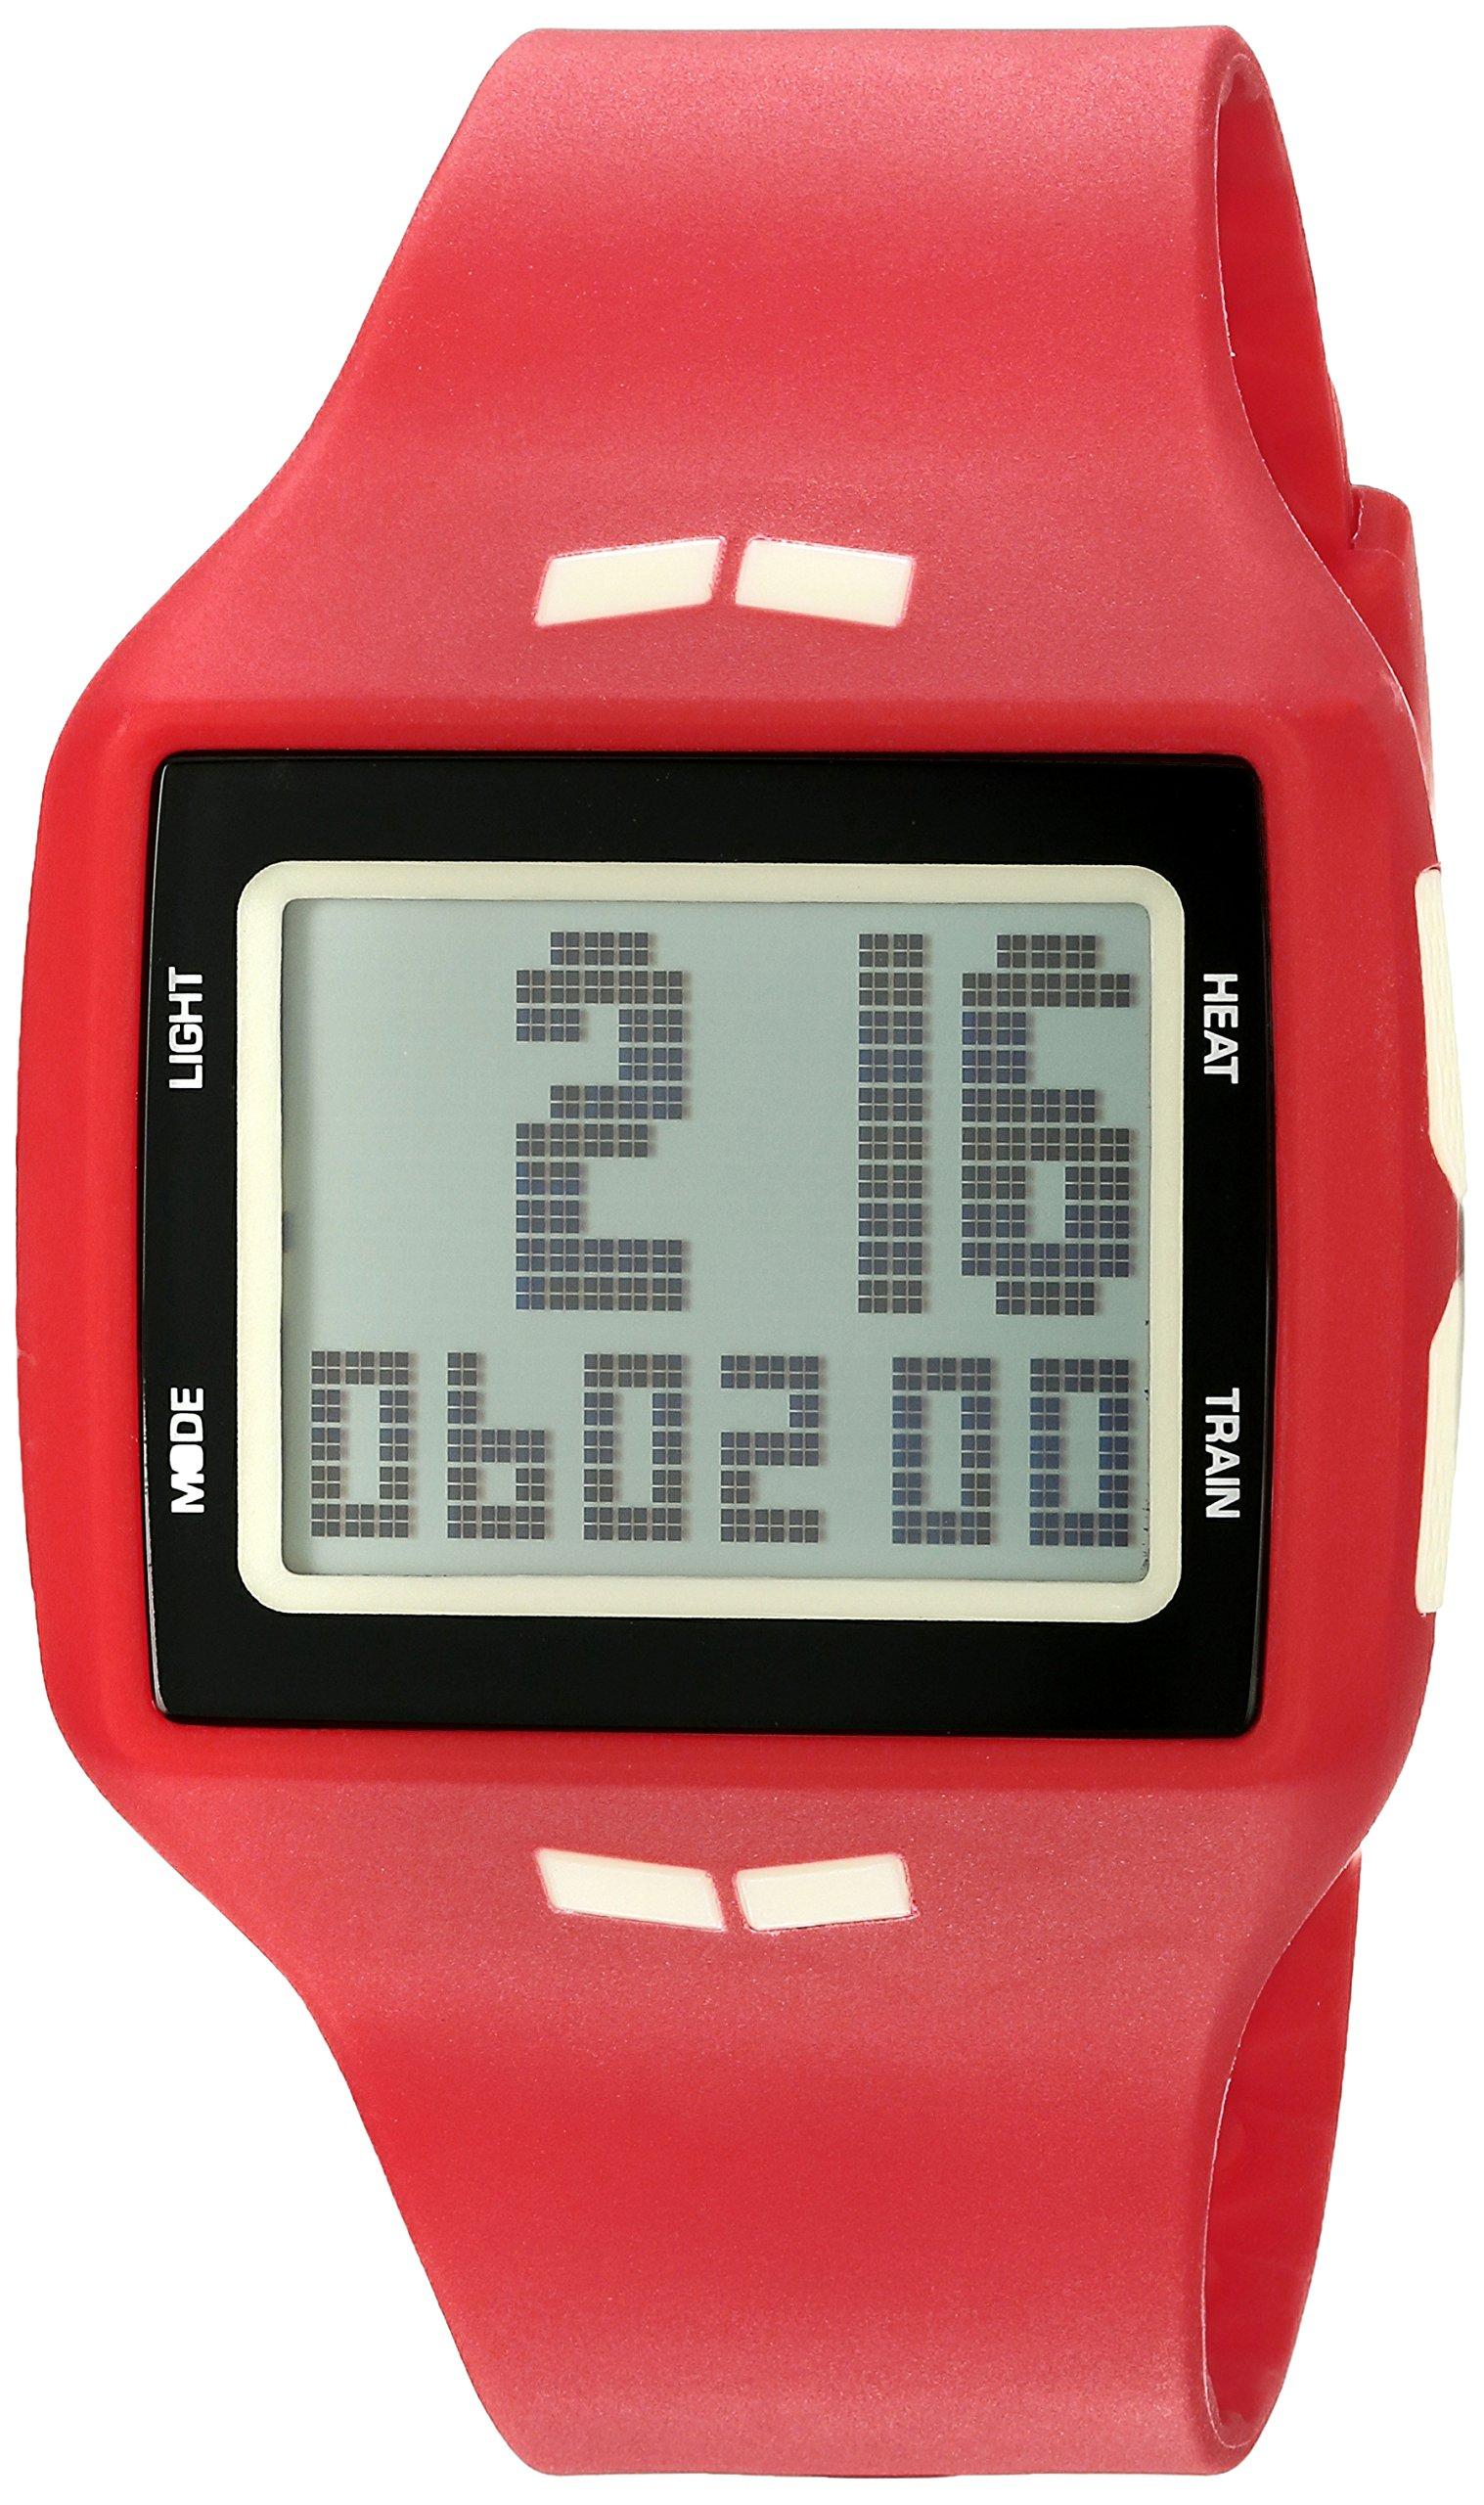 Vestal Unisex HLMDP25 Helm Digital Display Quartz Red Watch by VESTAL